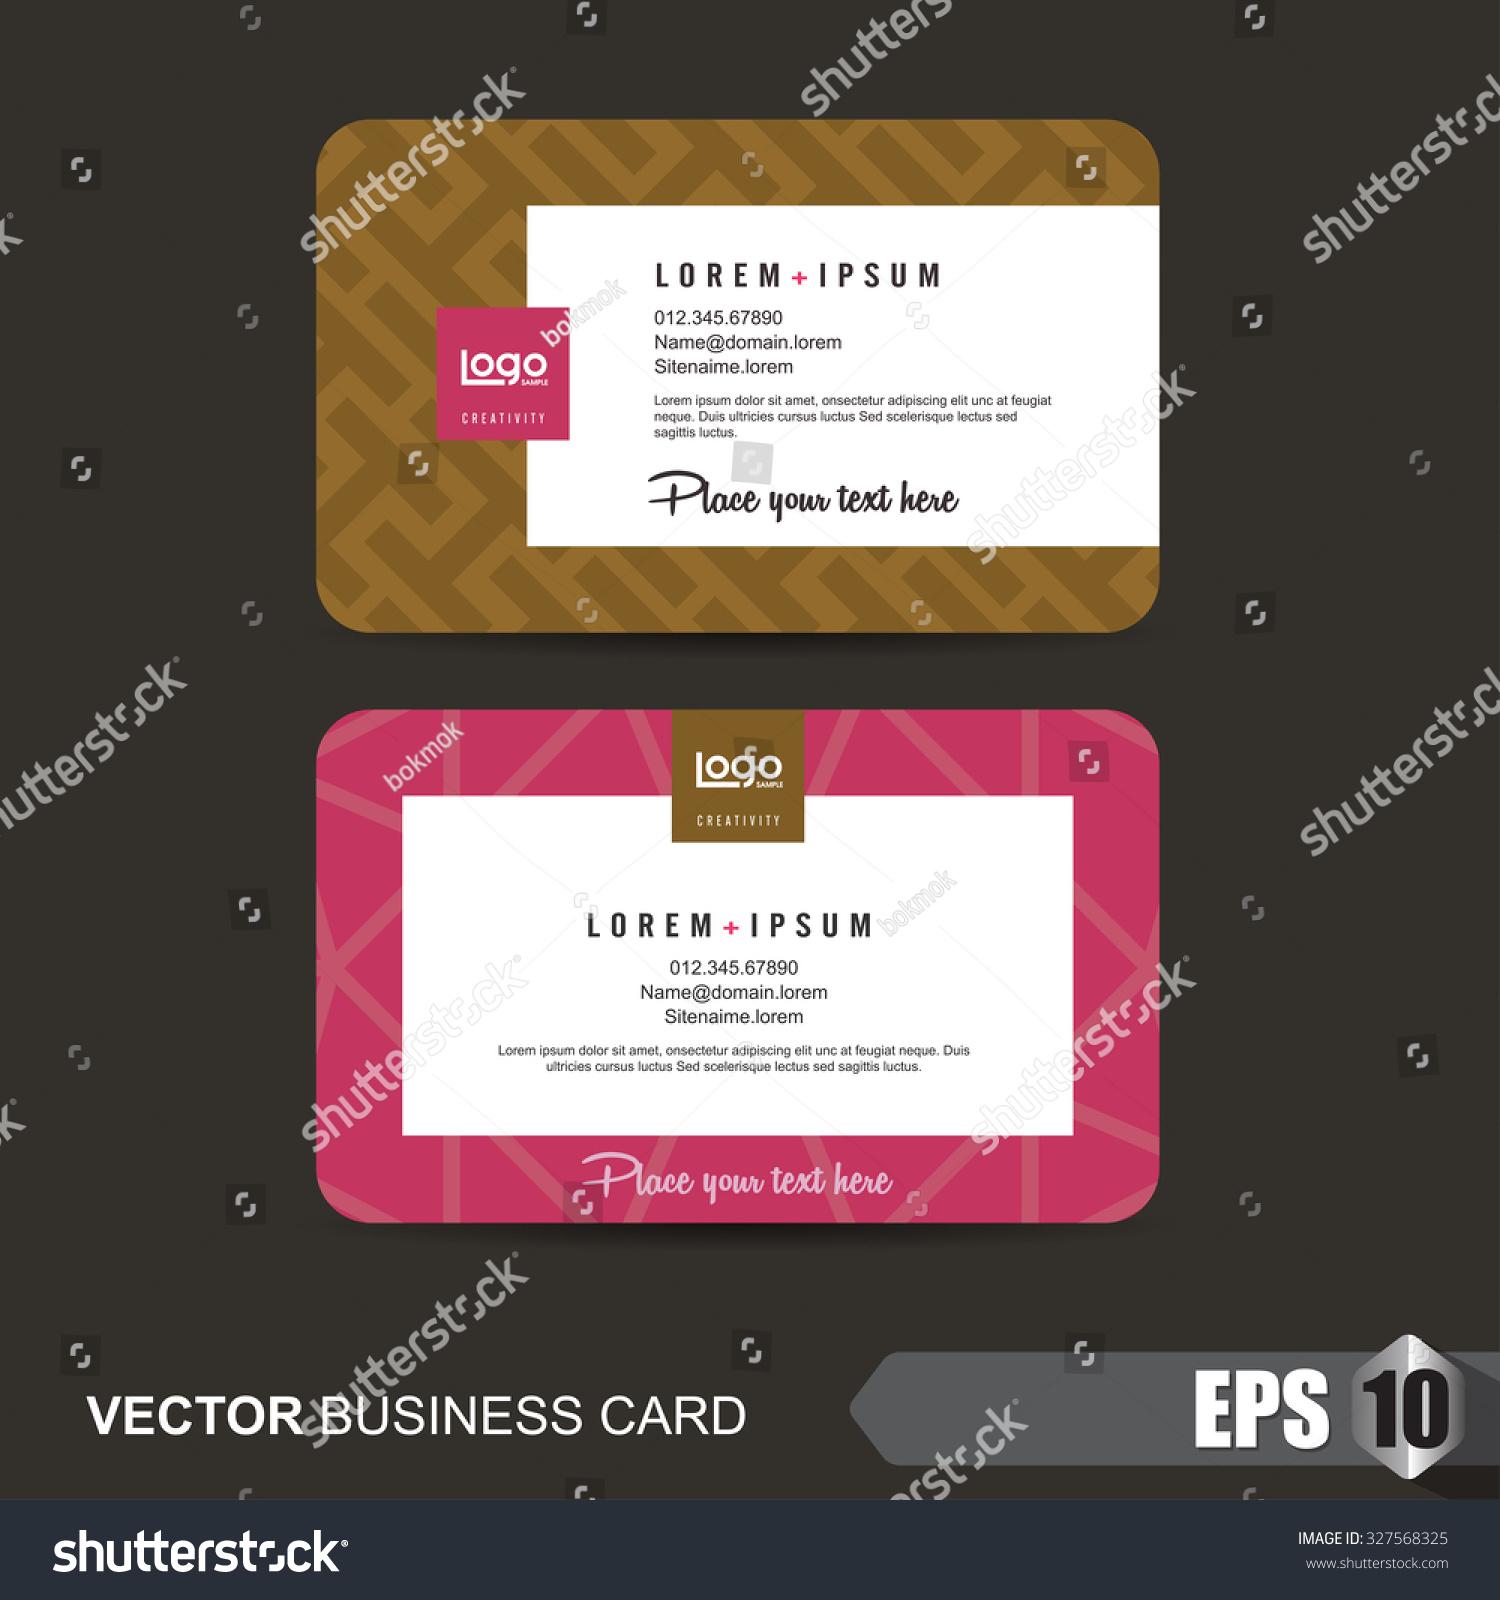 Business Card Templatetaglabelvector Illustration Stock Vector ...